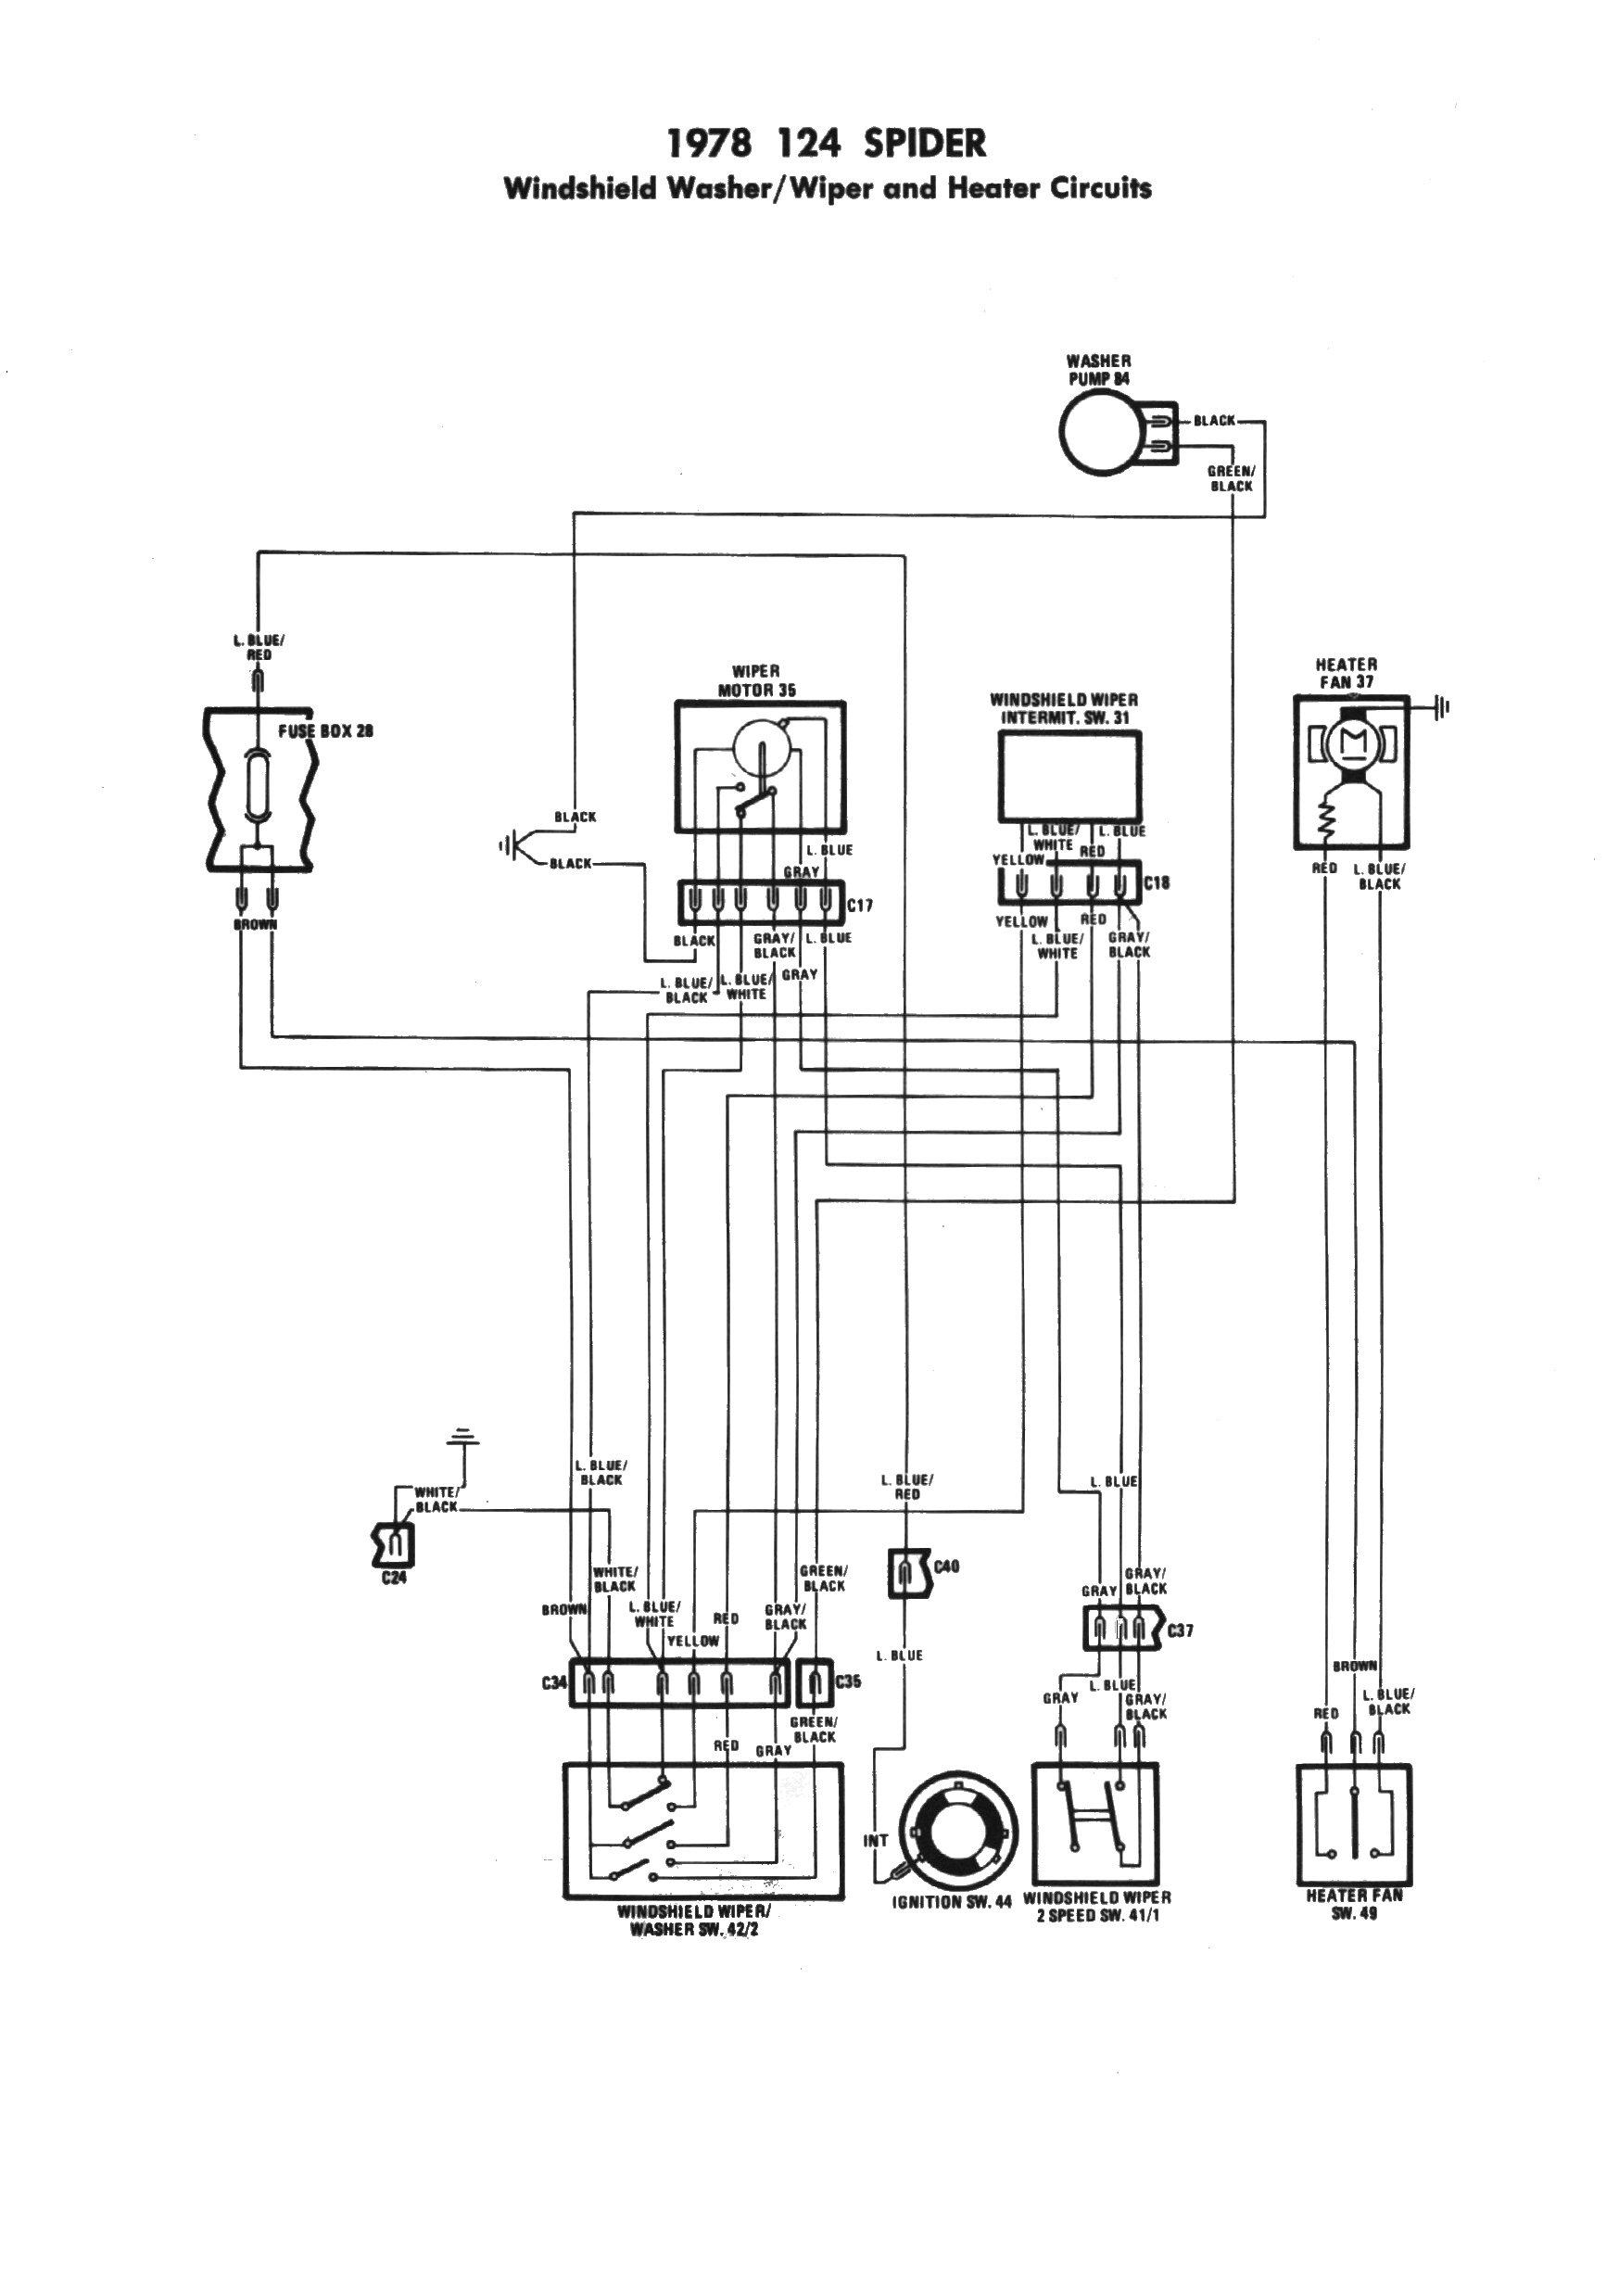 [FPER_4992]  HH_6735] 79 Fiat Spider Wiring Diagram Download Diagram | Wiring 1975 Fiat 124 Spider |  | Expe Mimig Apan Barep Arch Mimig Remca Sulf Gresi Mohammedshrine Librar  Wiring 101